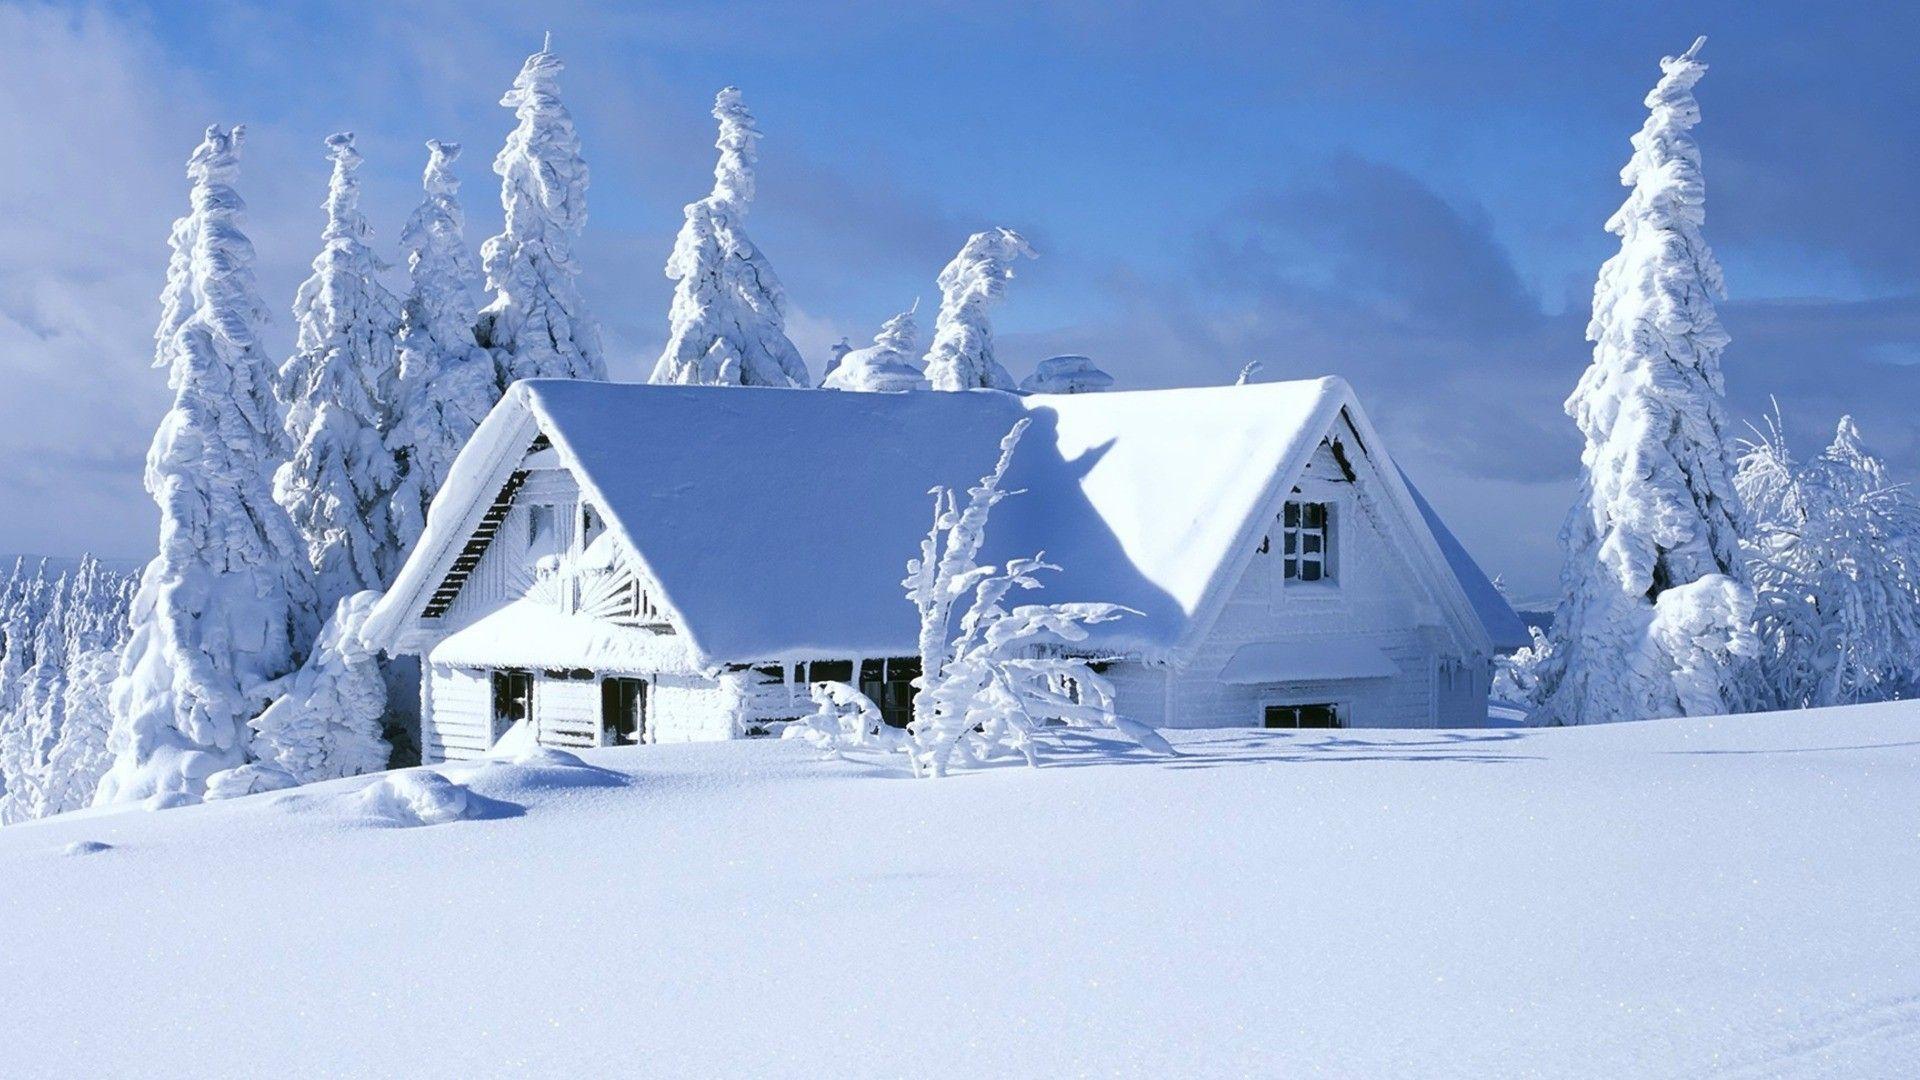 riroda, snow, winter - http://www.wallpapers4u.org/riroda-snow-winter/